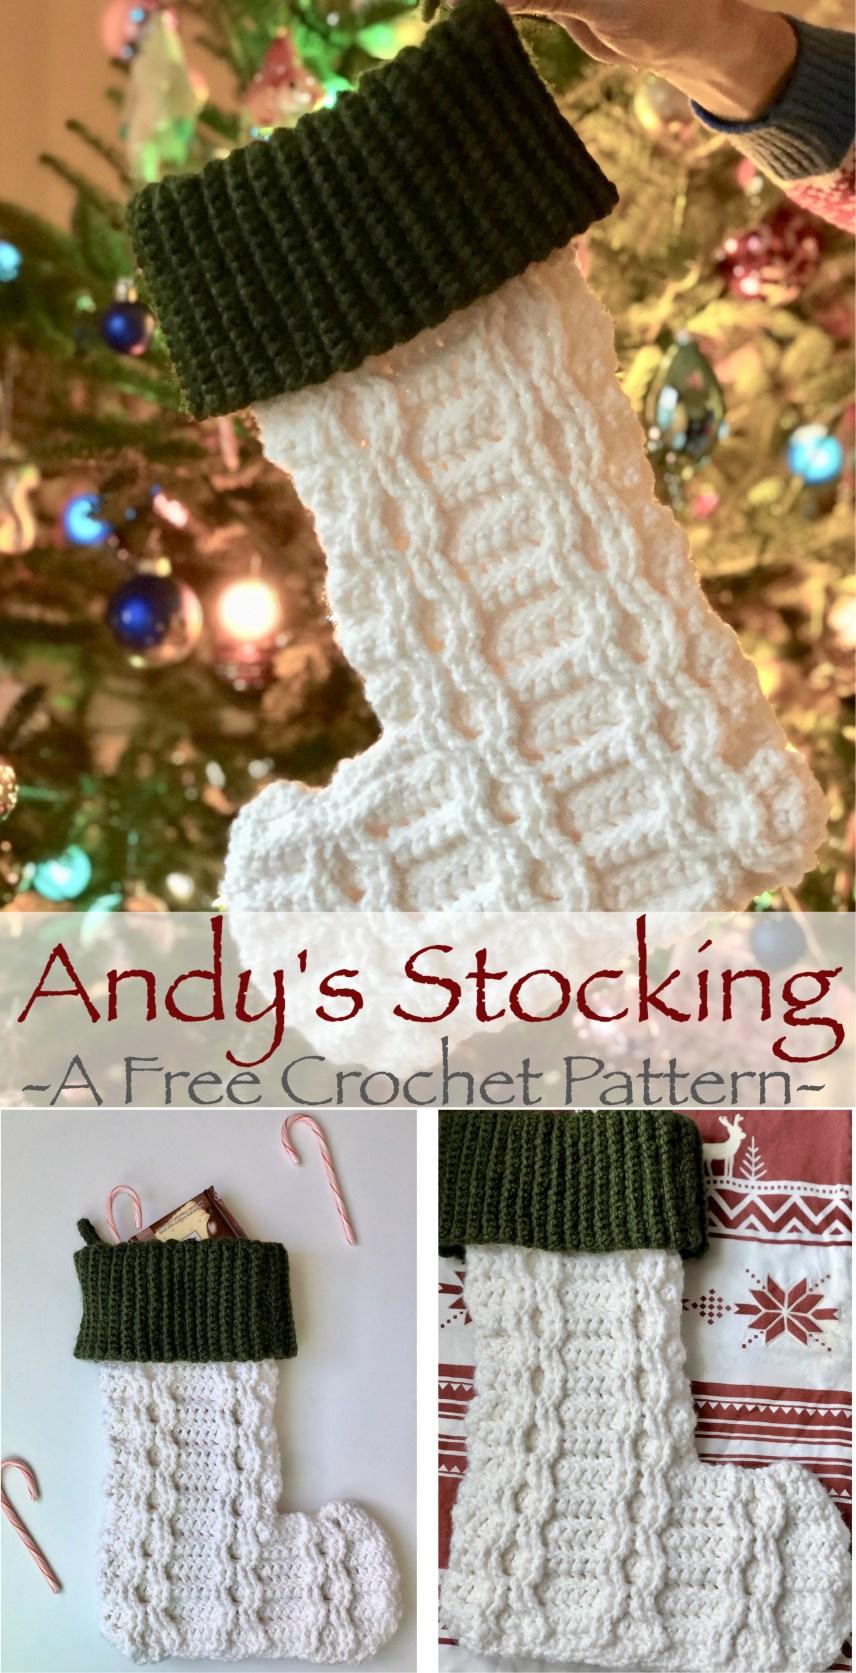 Andy's Stocking- Free Crochet Pattern .jpg